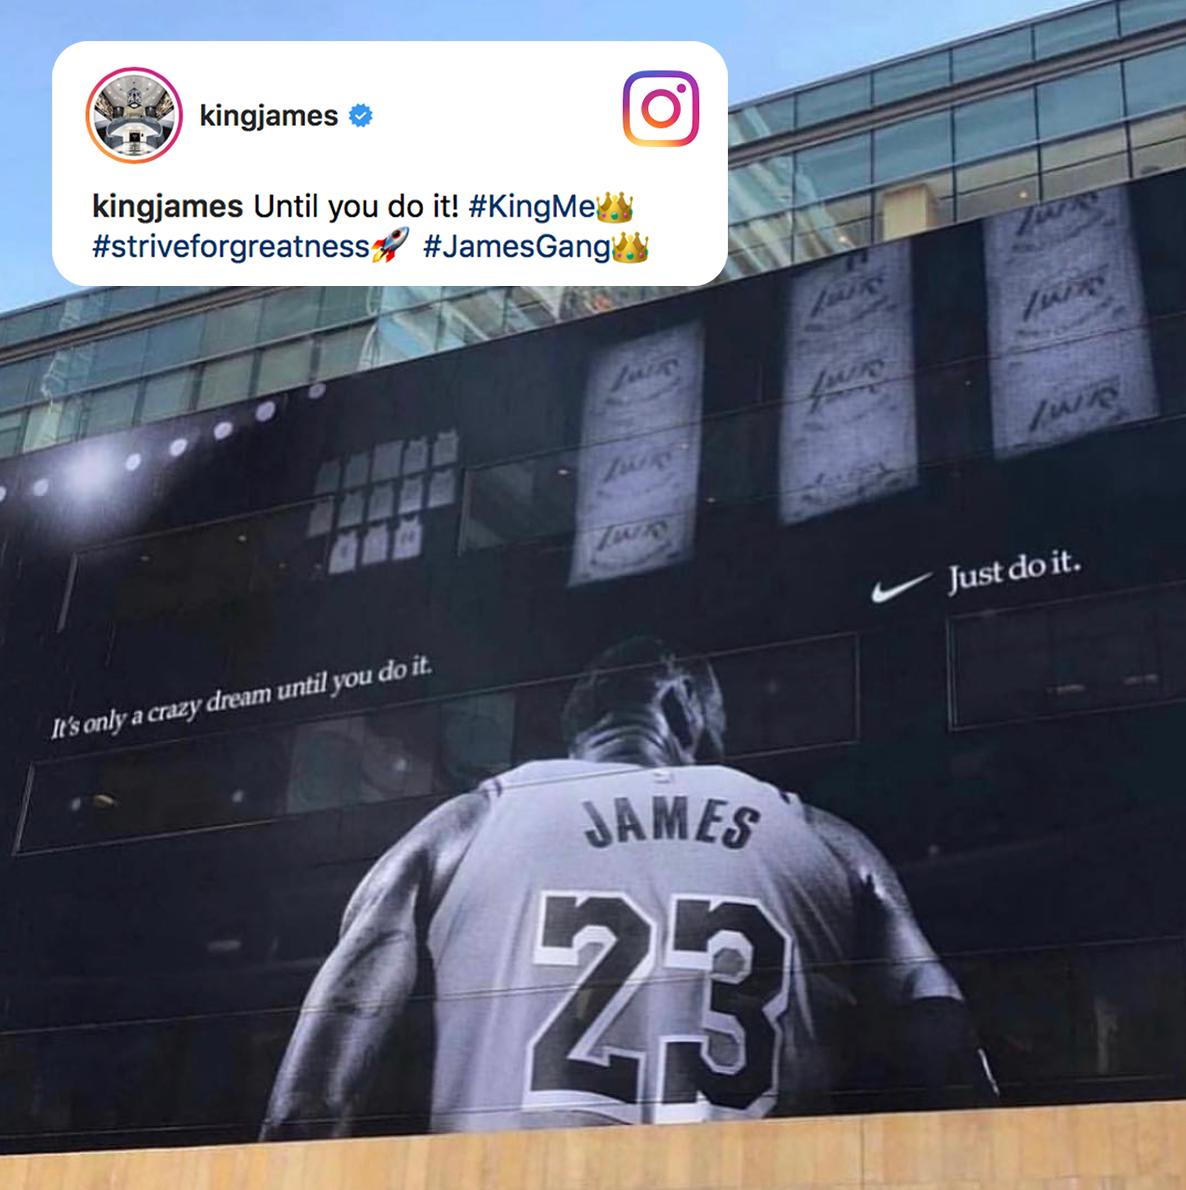 A billboard fit for a King �� (via @KingJames) https://t.co/Az7H49N8HV